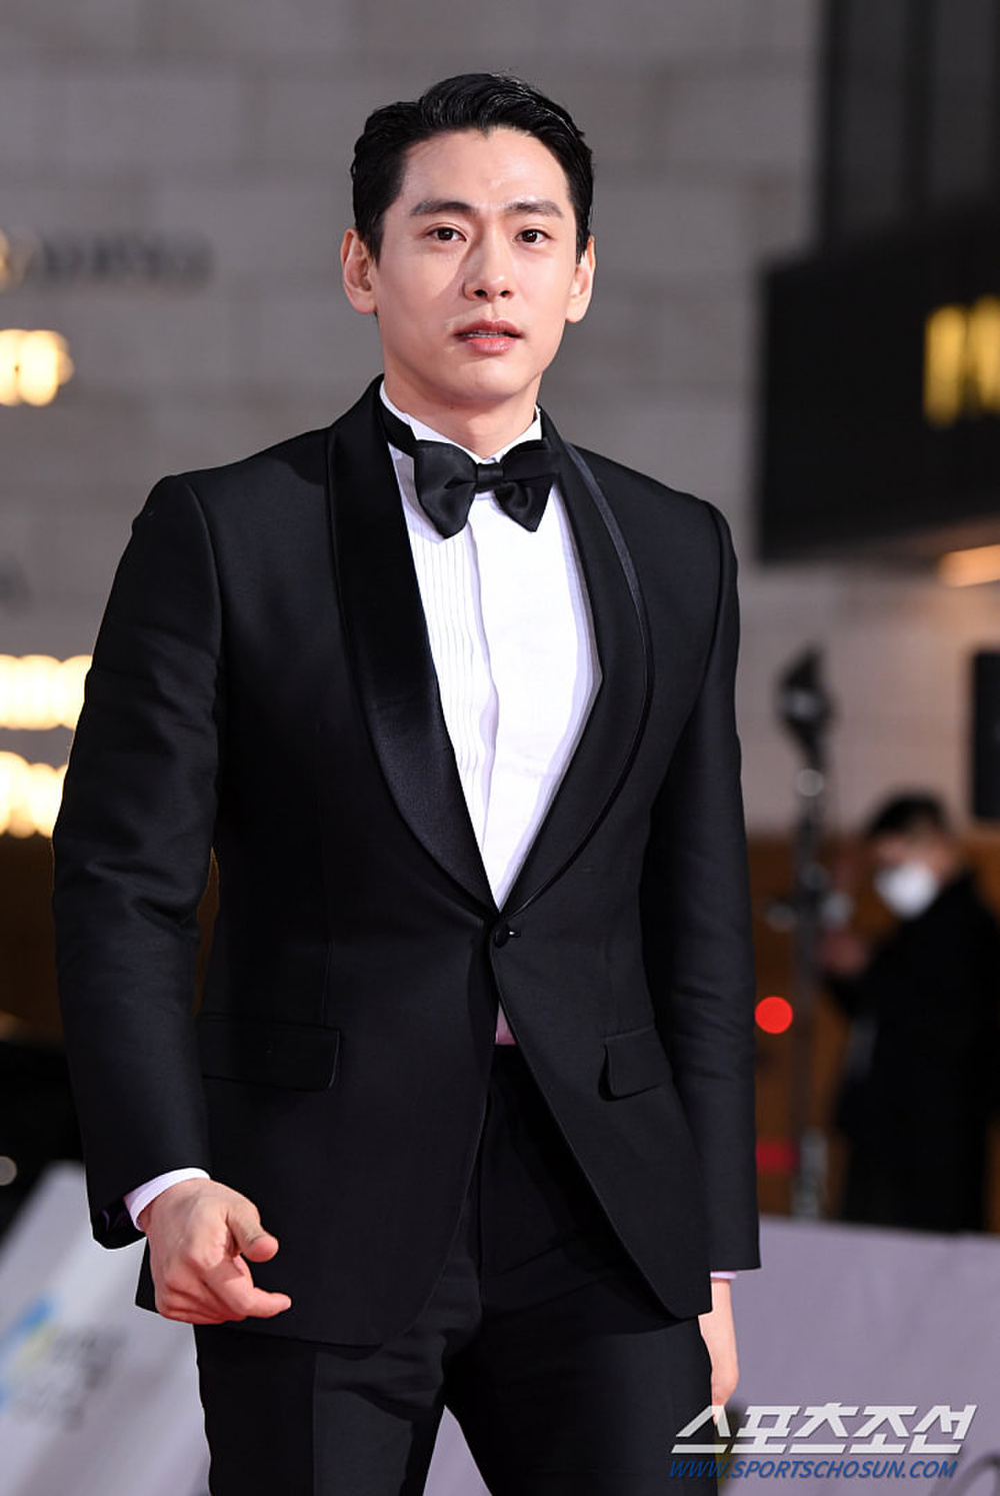 Thảm đỏ 'Rồng xanh 2020': Shin Hye Sun 'cân sắc' Shin Min Ah, Jung Woo Sung - Lee Byung Hun điển trai! Ảnh 35